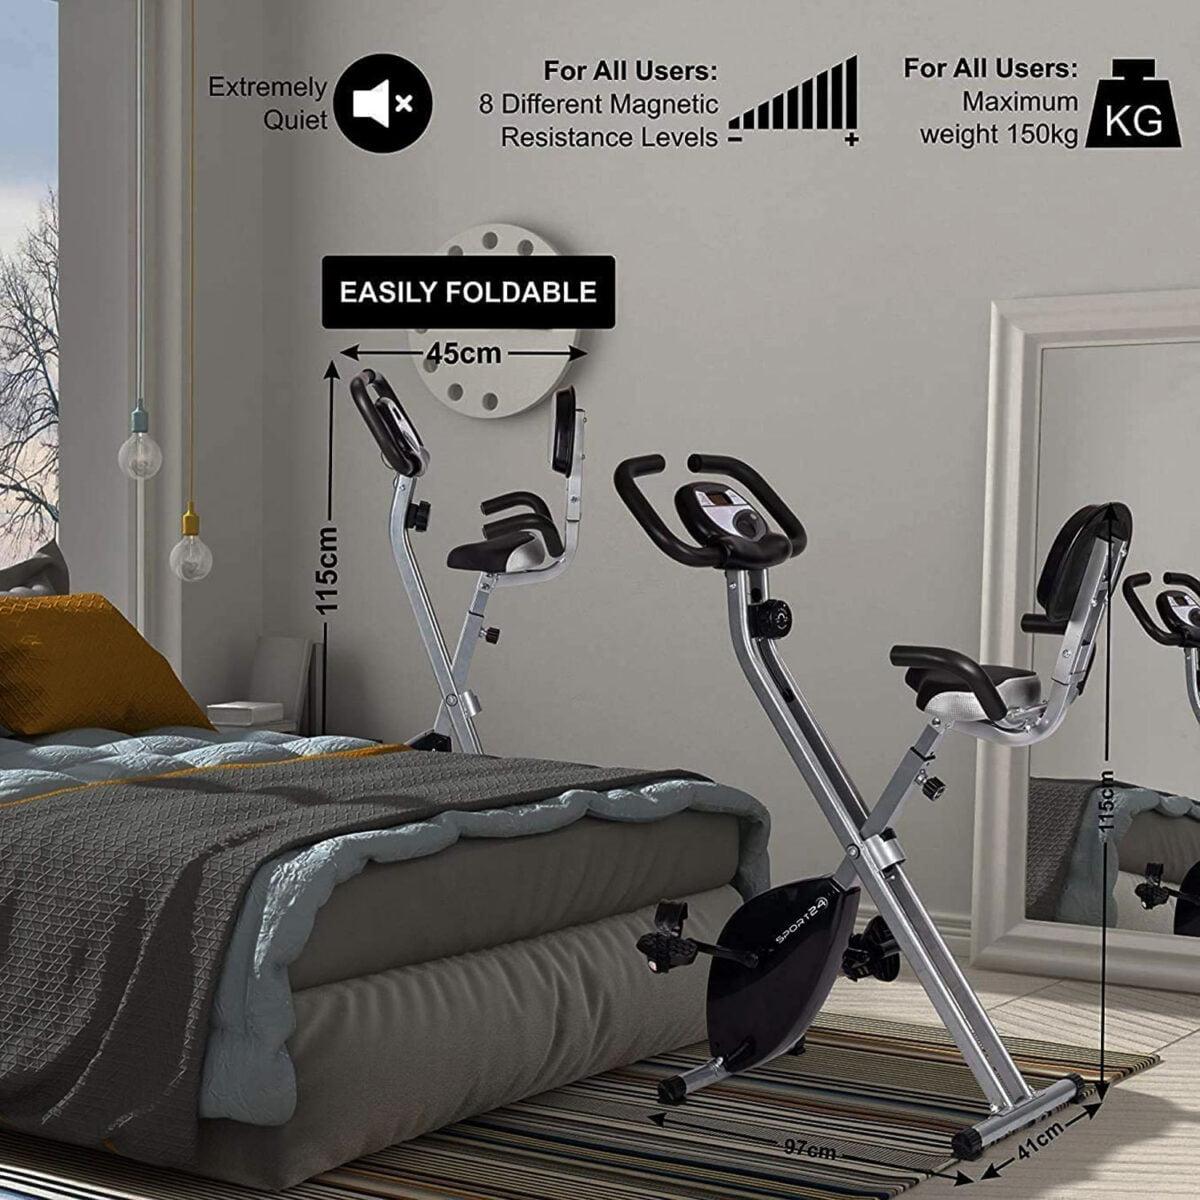 SPORT24 Folding Upright Exercise Bike in bedroom